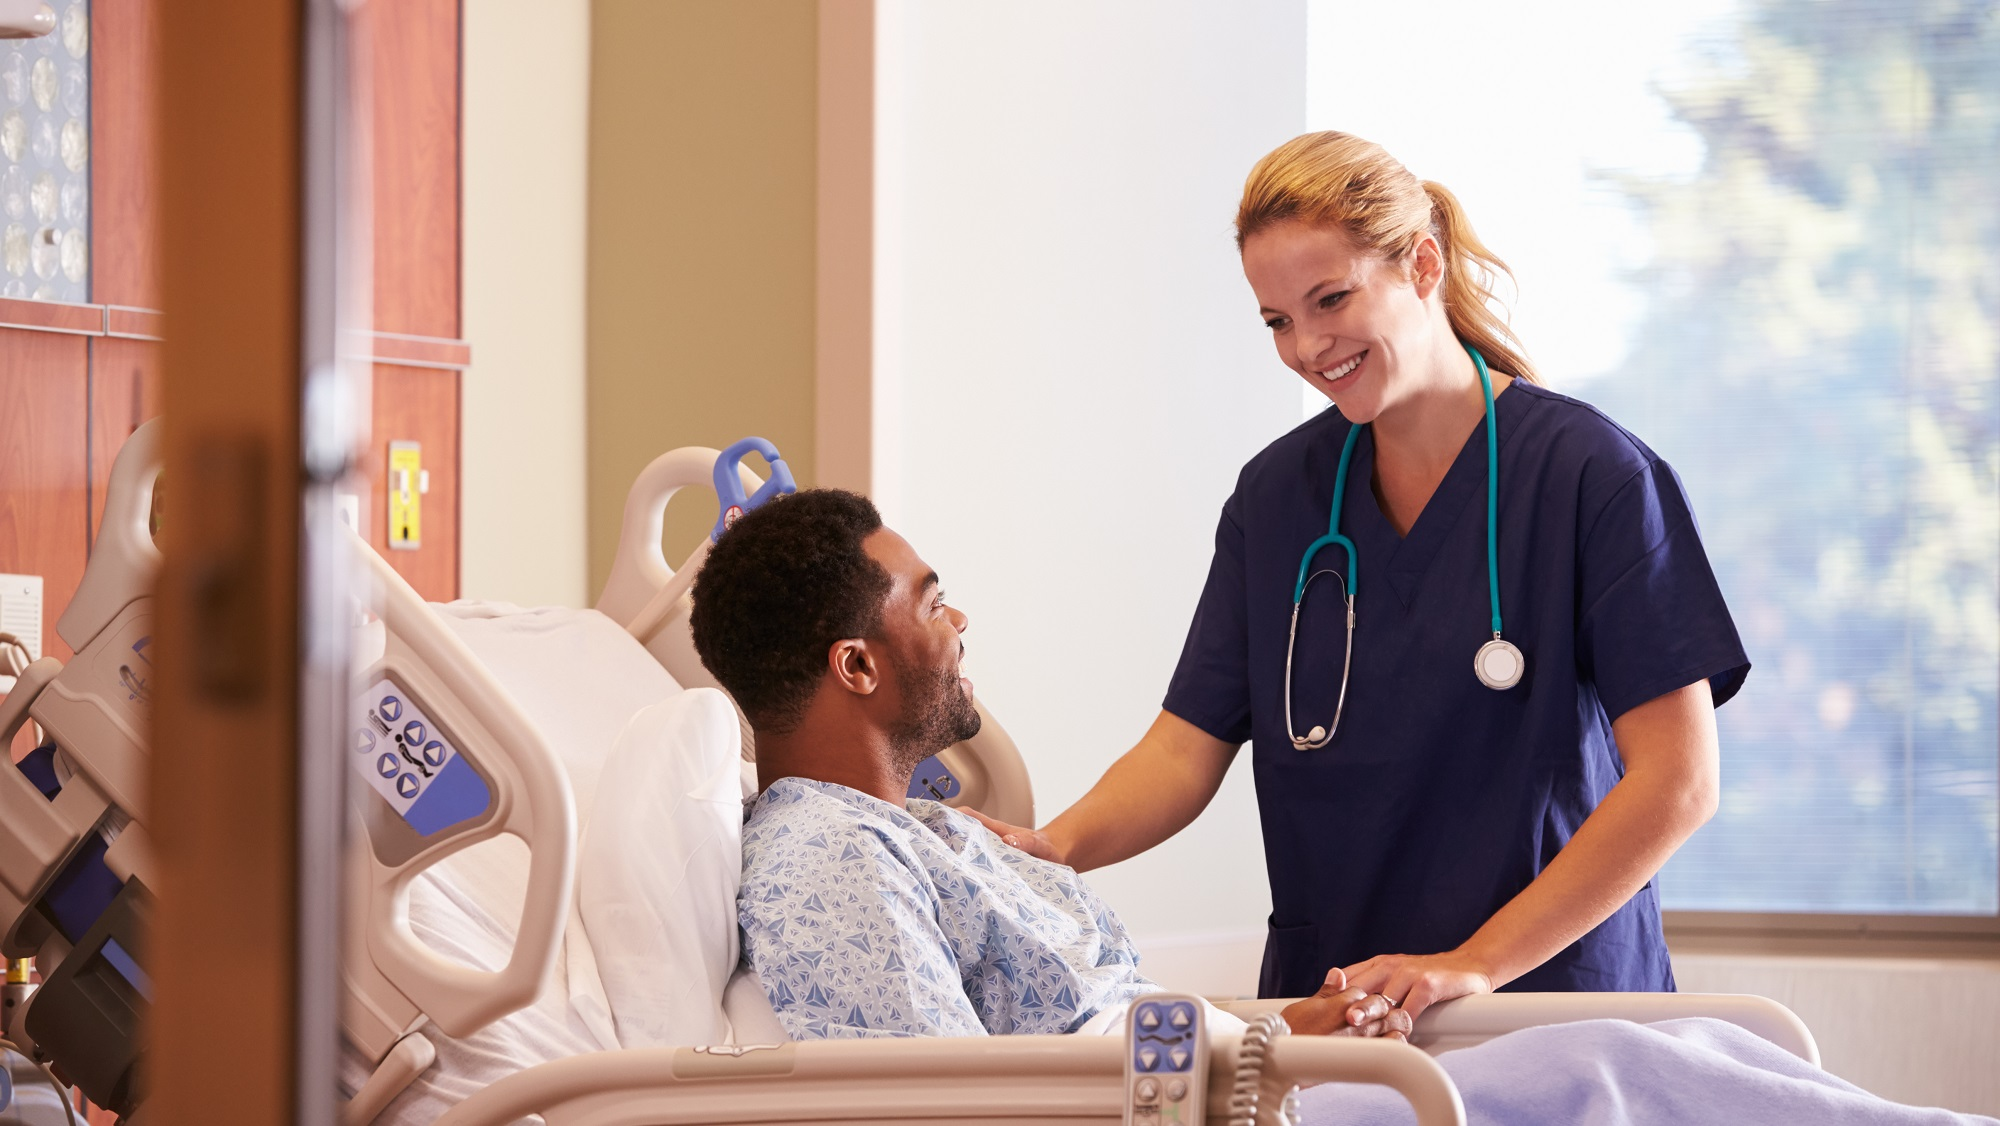 nurses blog - a career in nursing